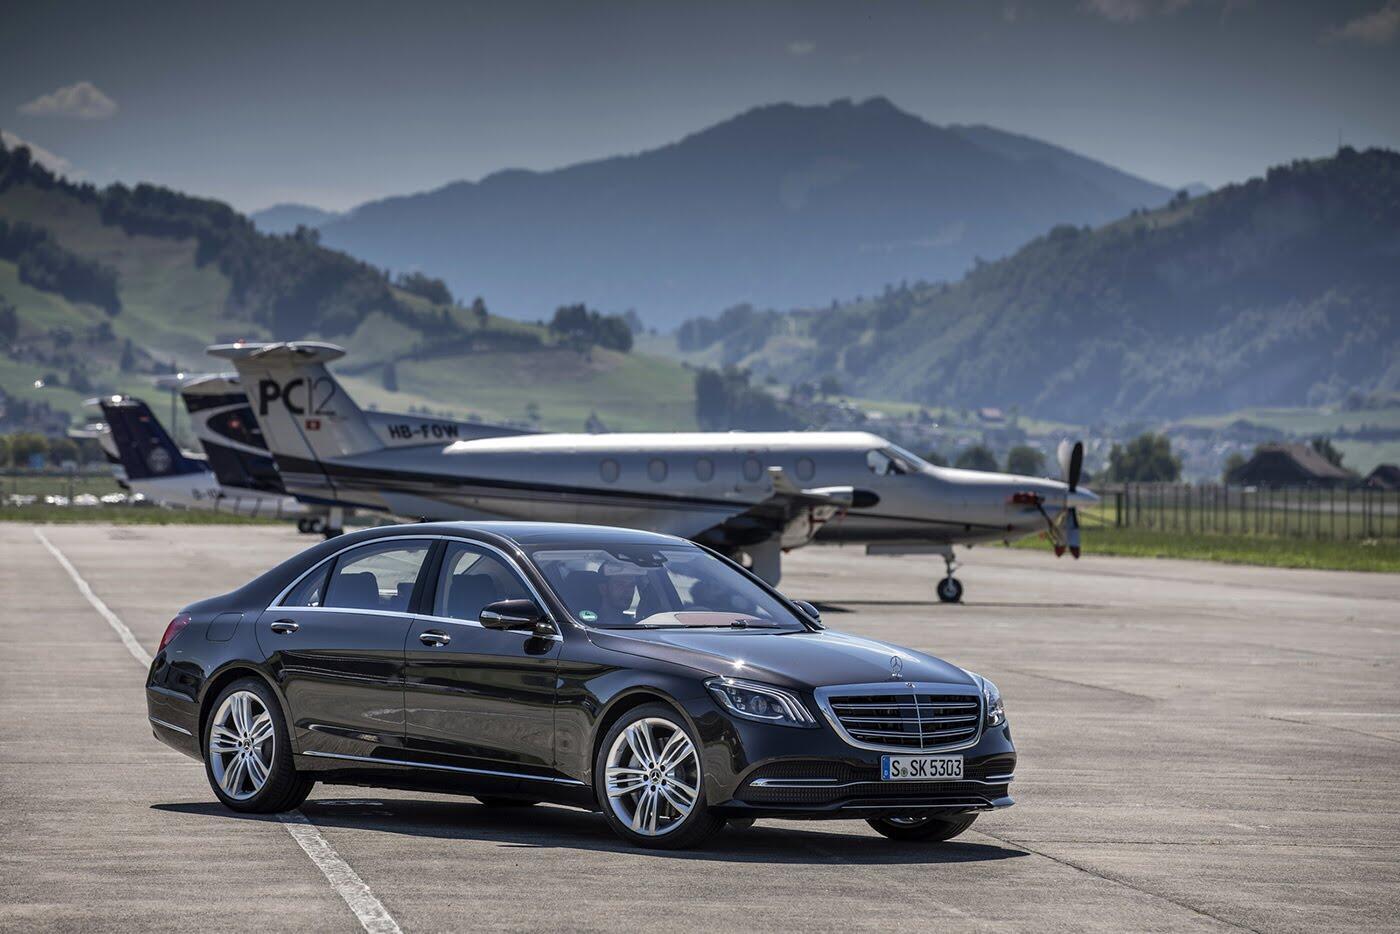 Ảnh chi tiết Mercedes-Benz S-Class 2018 - Hình 20